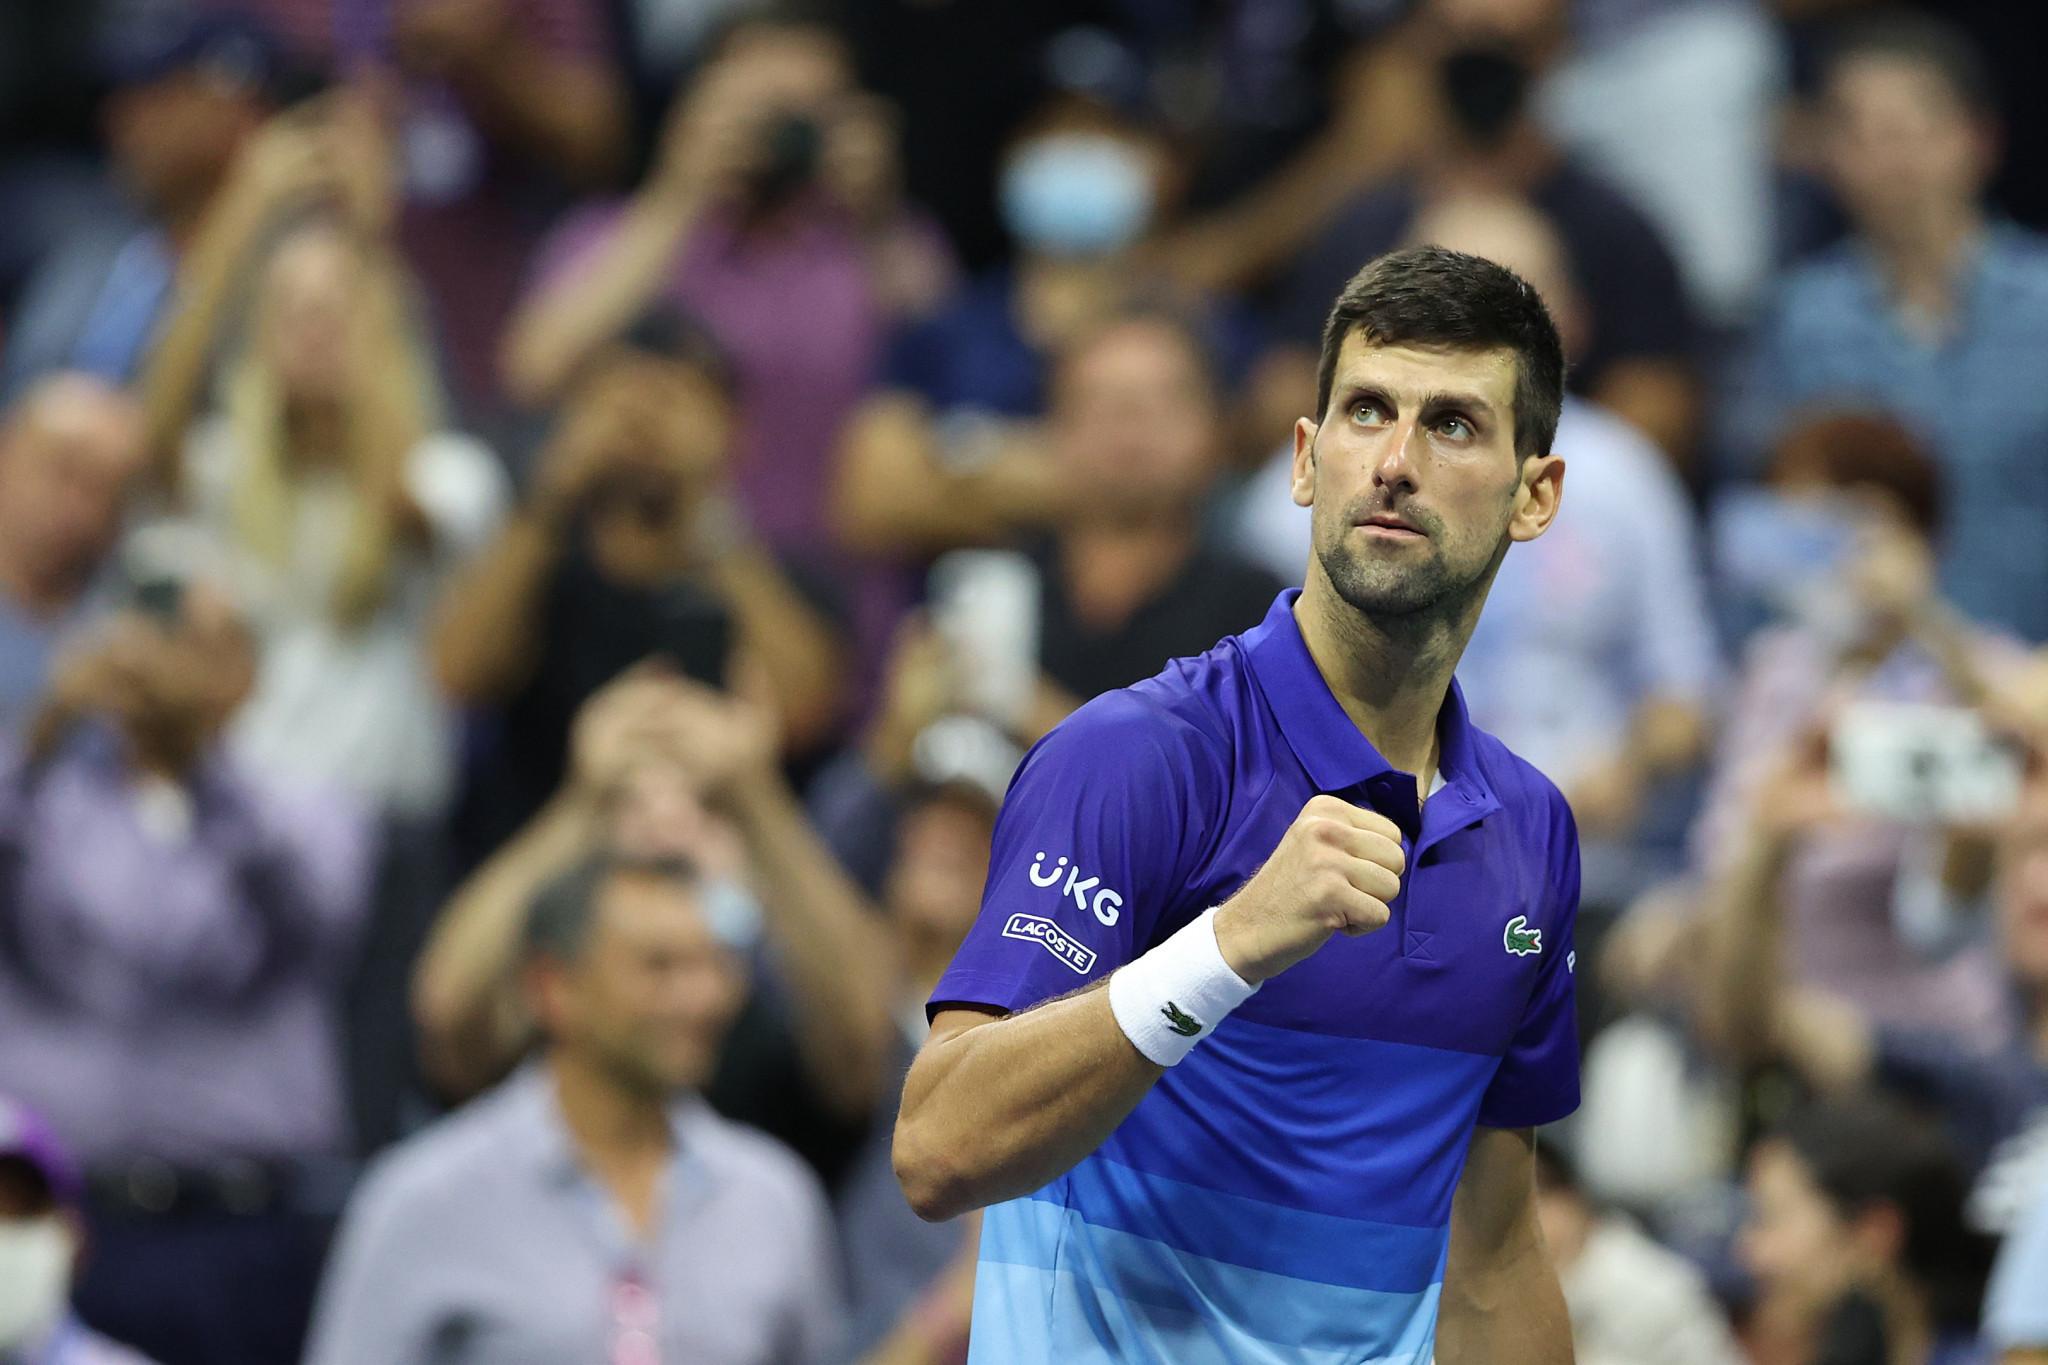 Djokovic sets up US Open semi-final clash with Zverev as win over Berrettini continues calendar Grand Slam bid